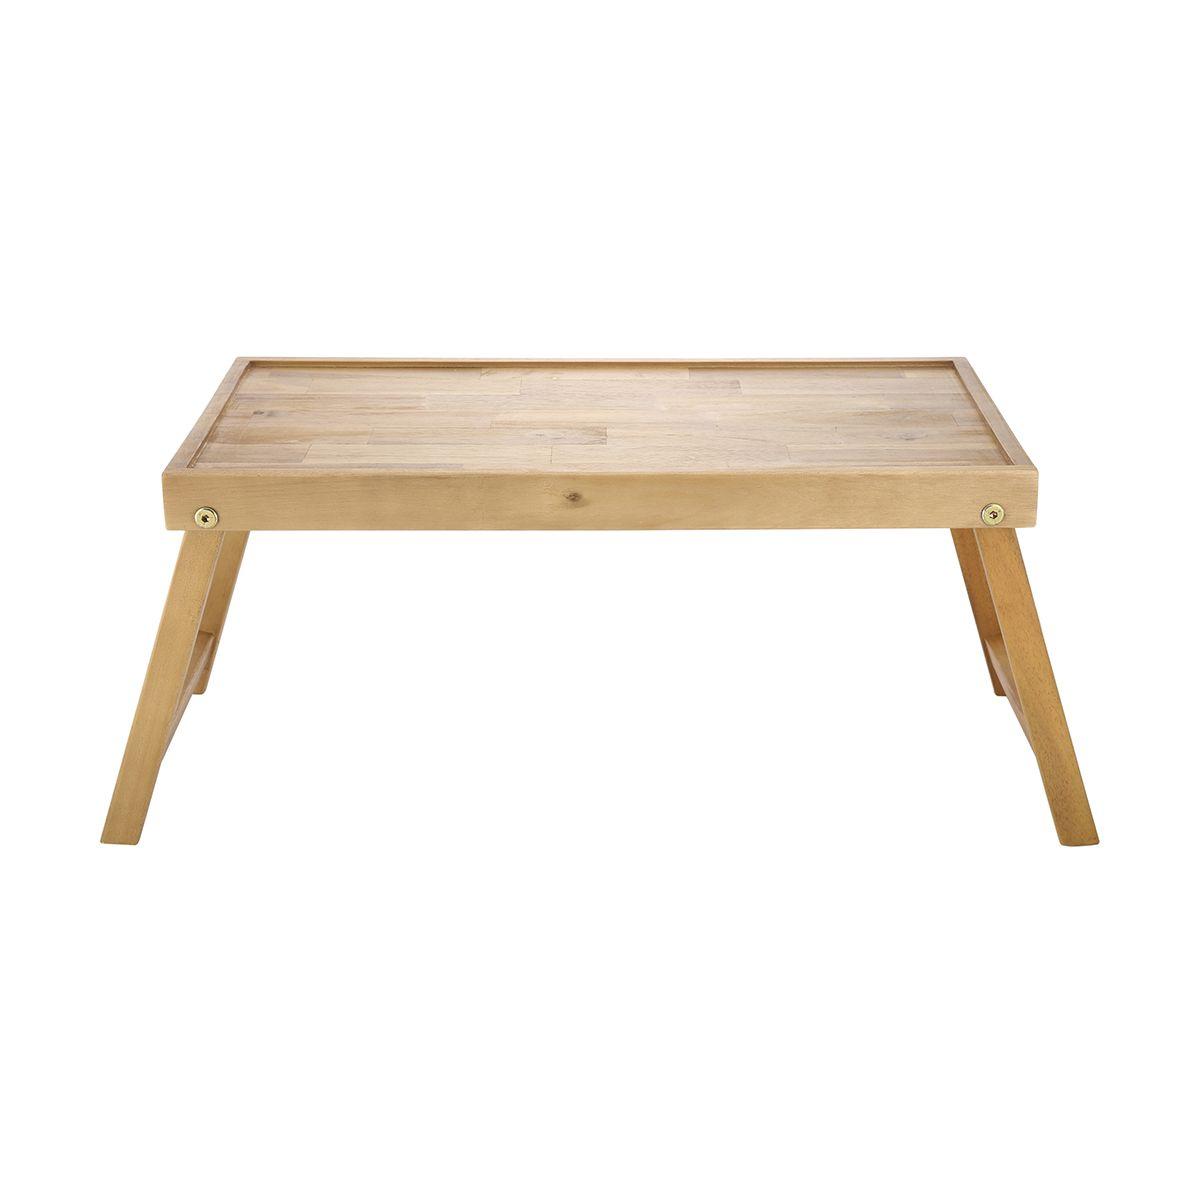 Folding Serve Tray Desk Decor Desk Tray Bed Linens Luxury